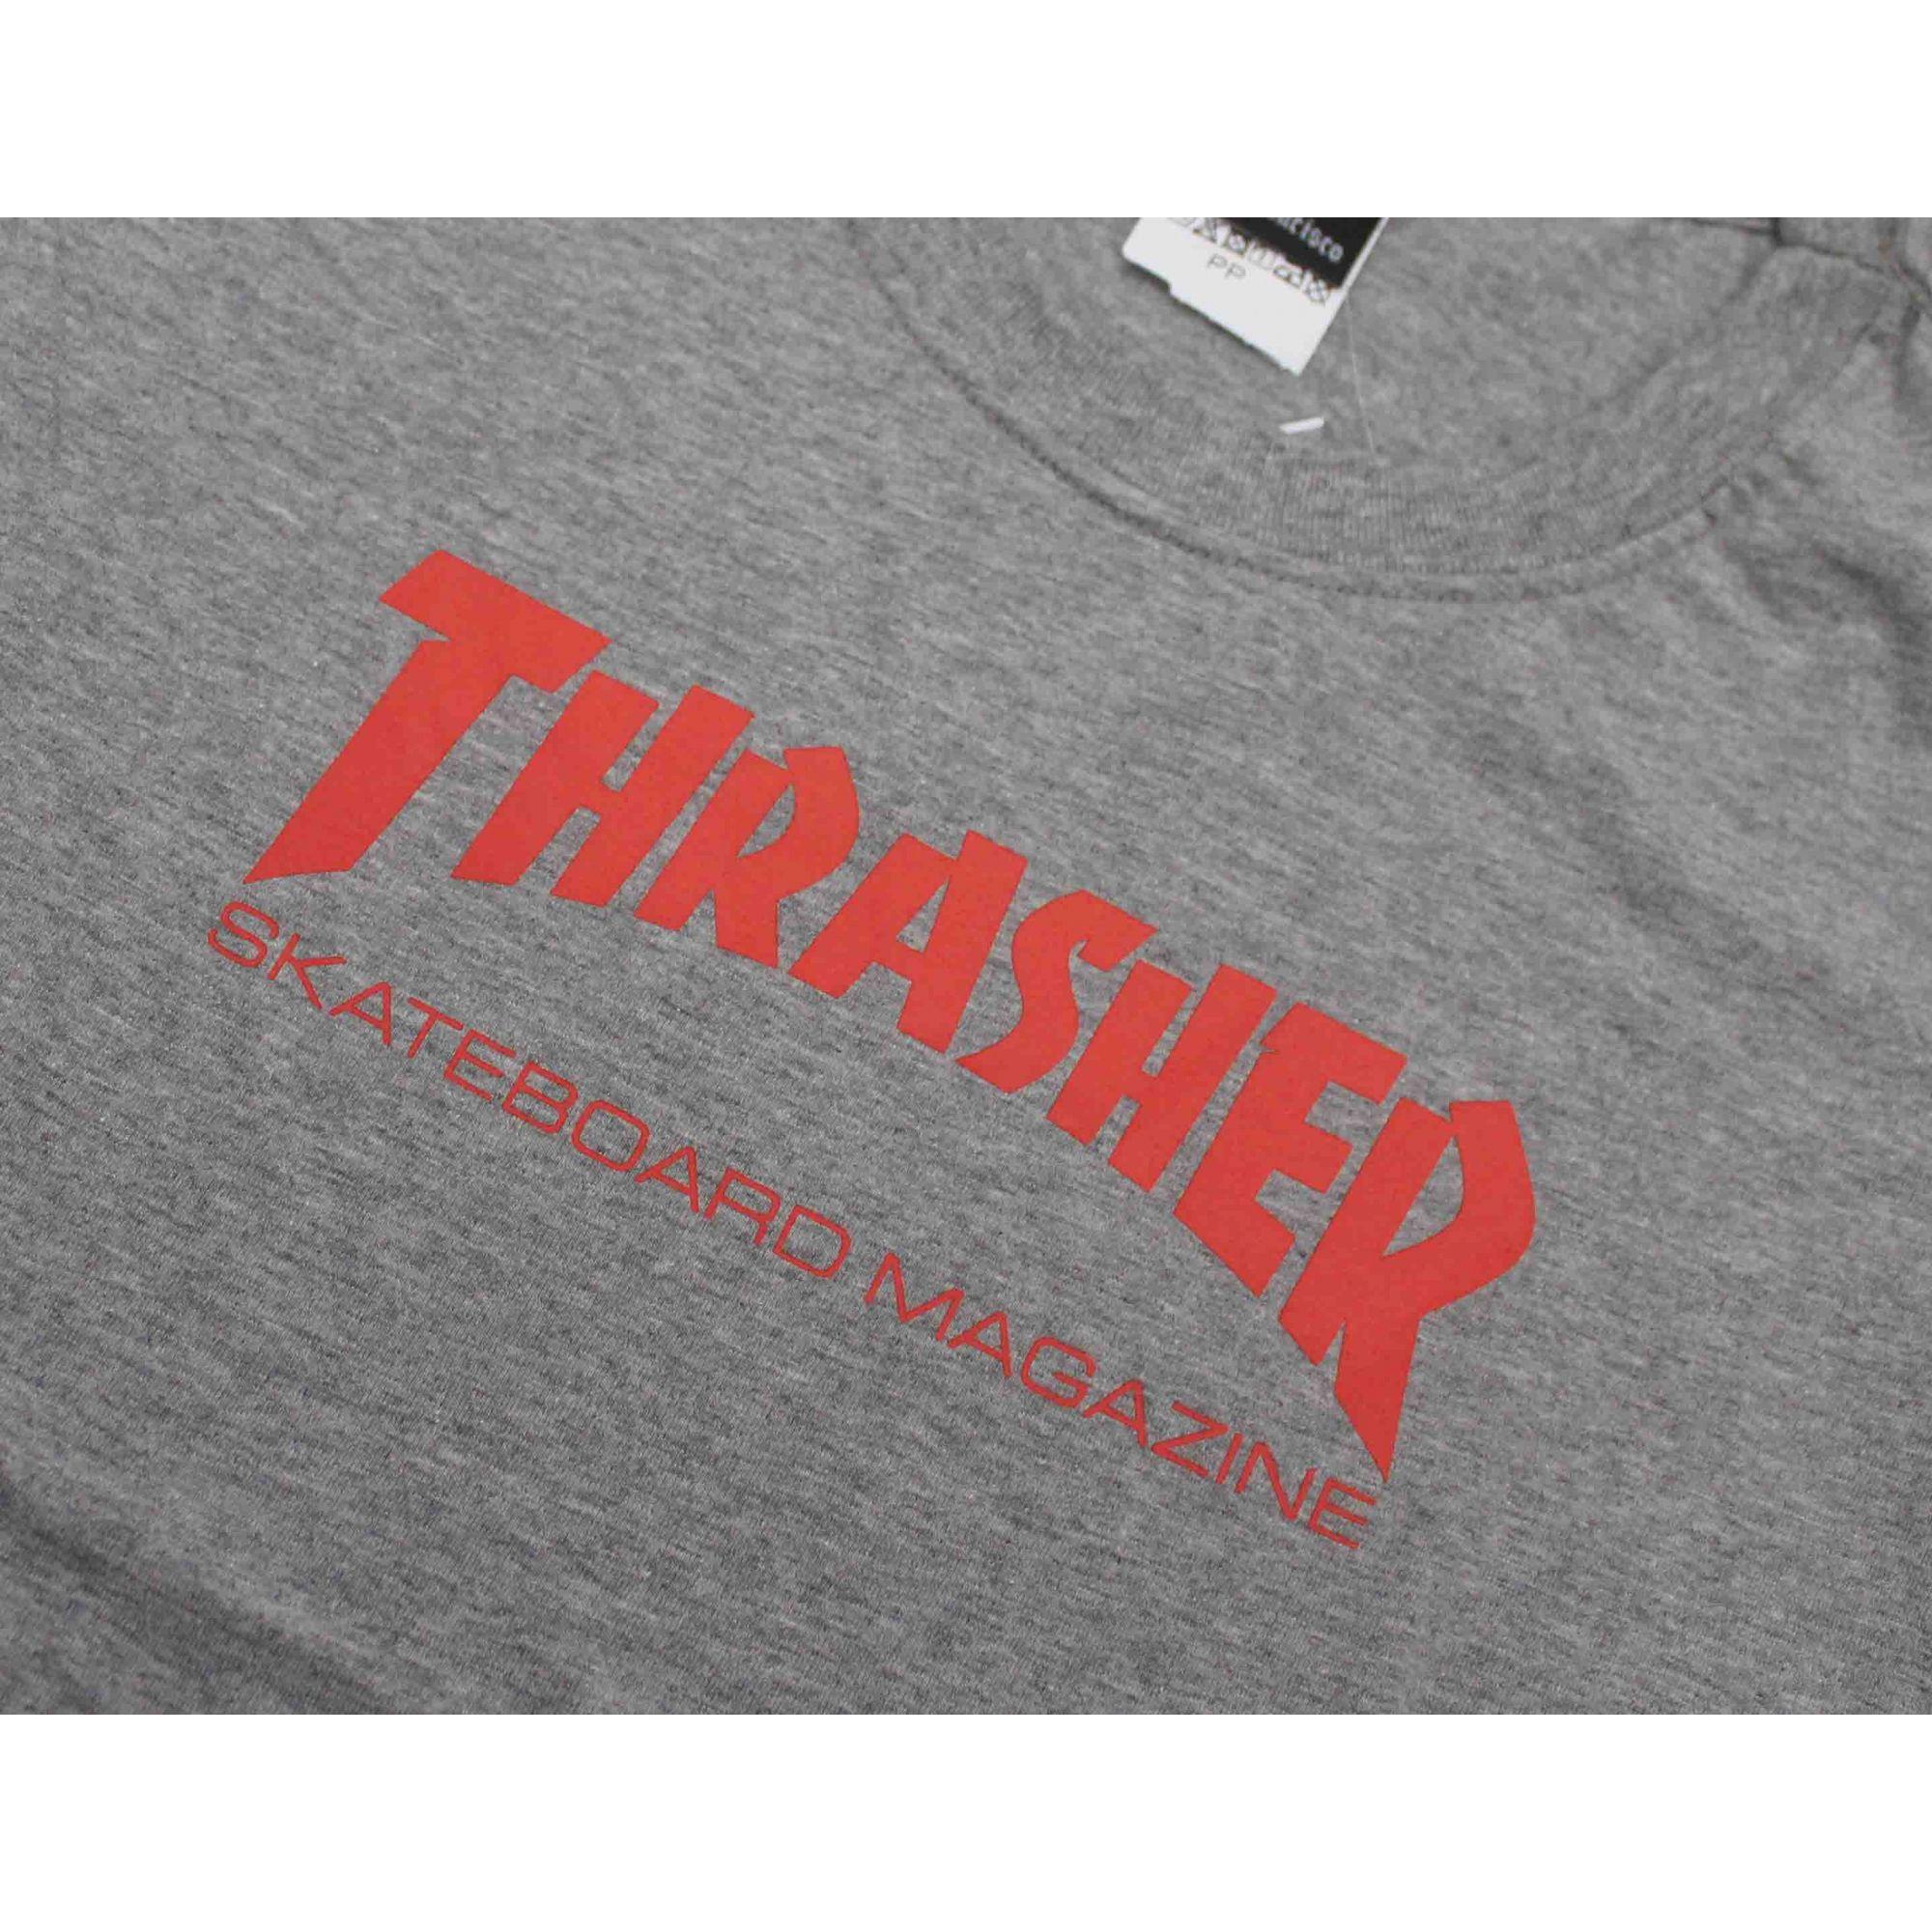 Camiseta Feminina Thrasher Magazine Skate Mag Grey